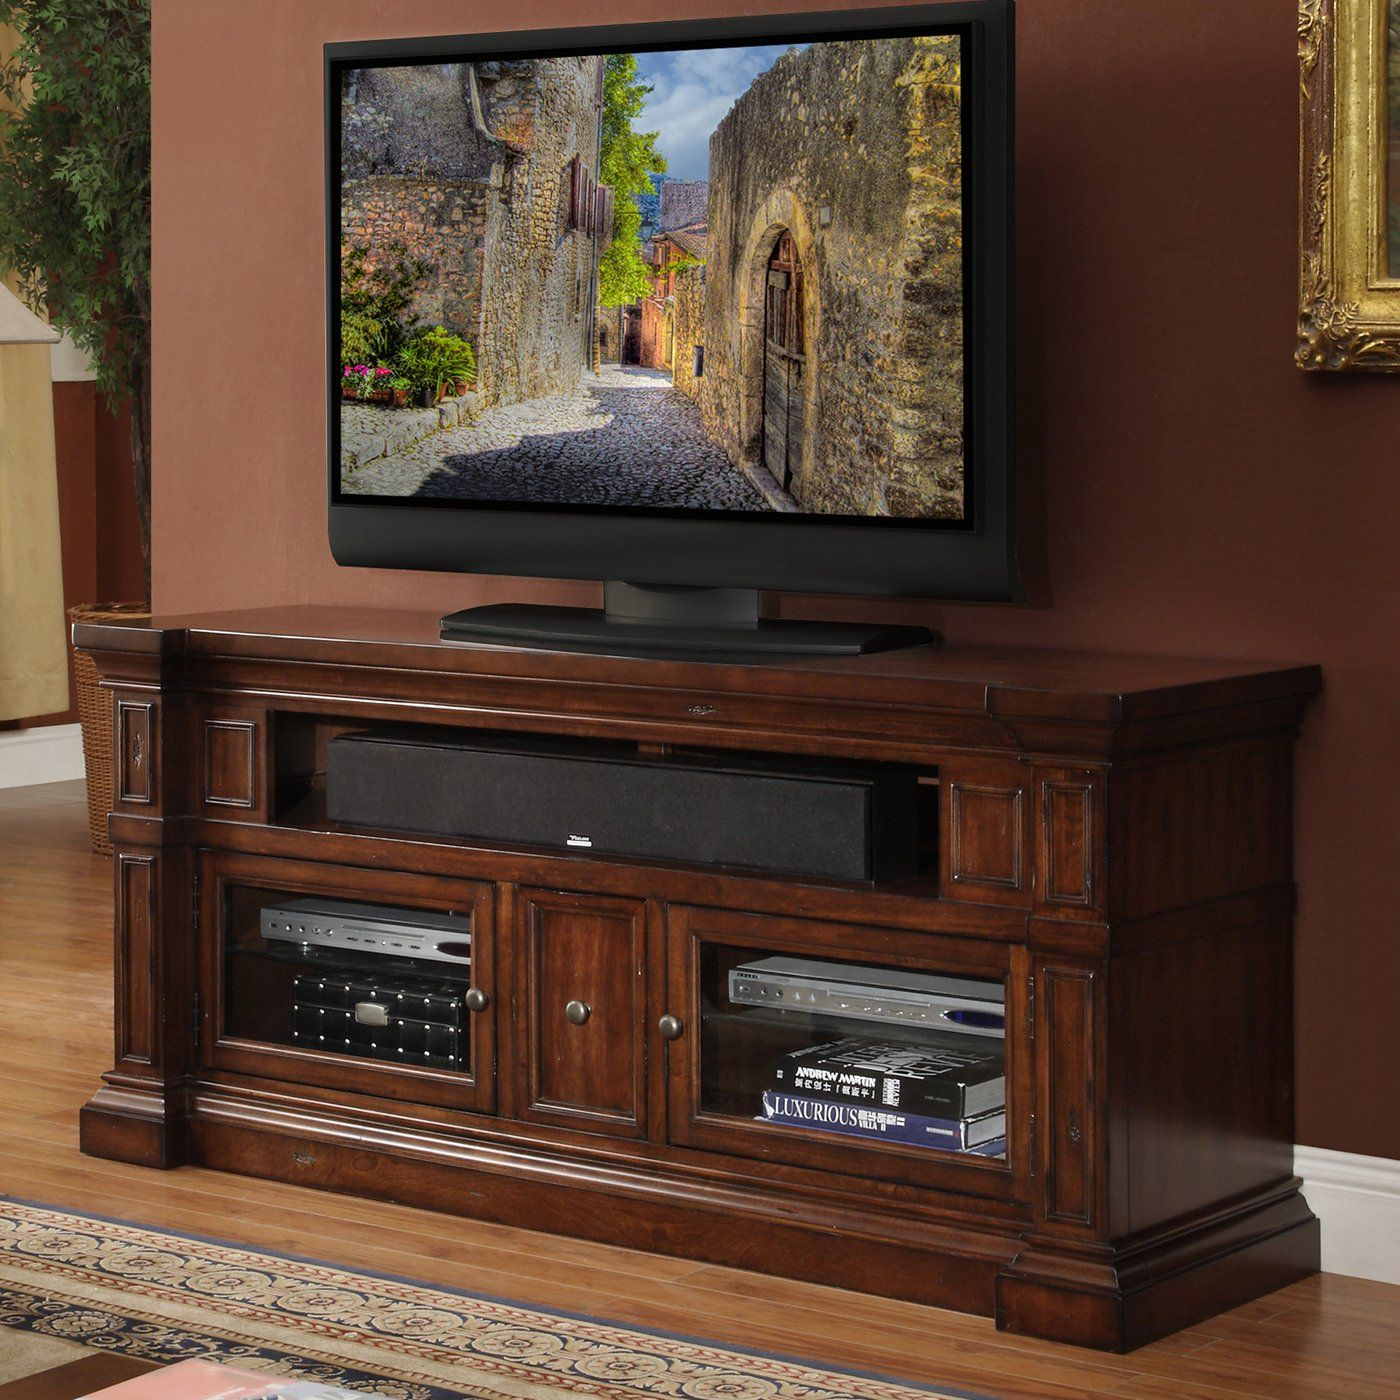 legends products furniture height hudson shaped trim station l s zl zsuz item width desk super cupboard threshold z